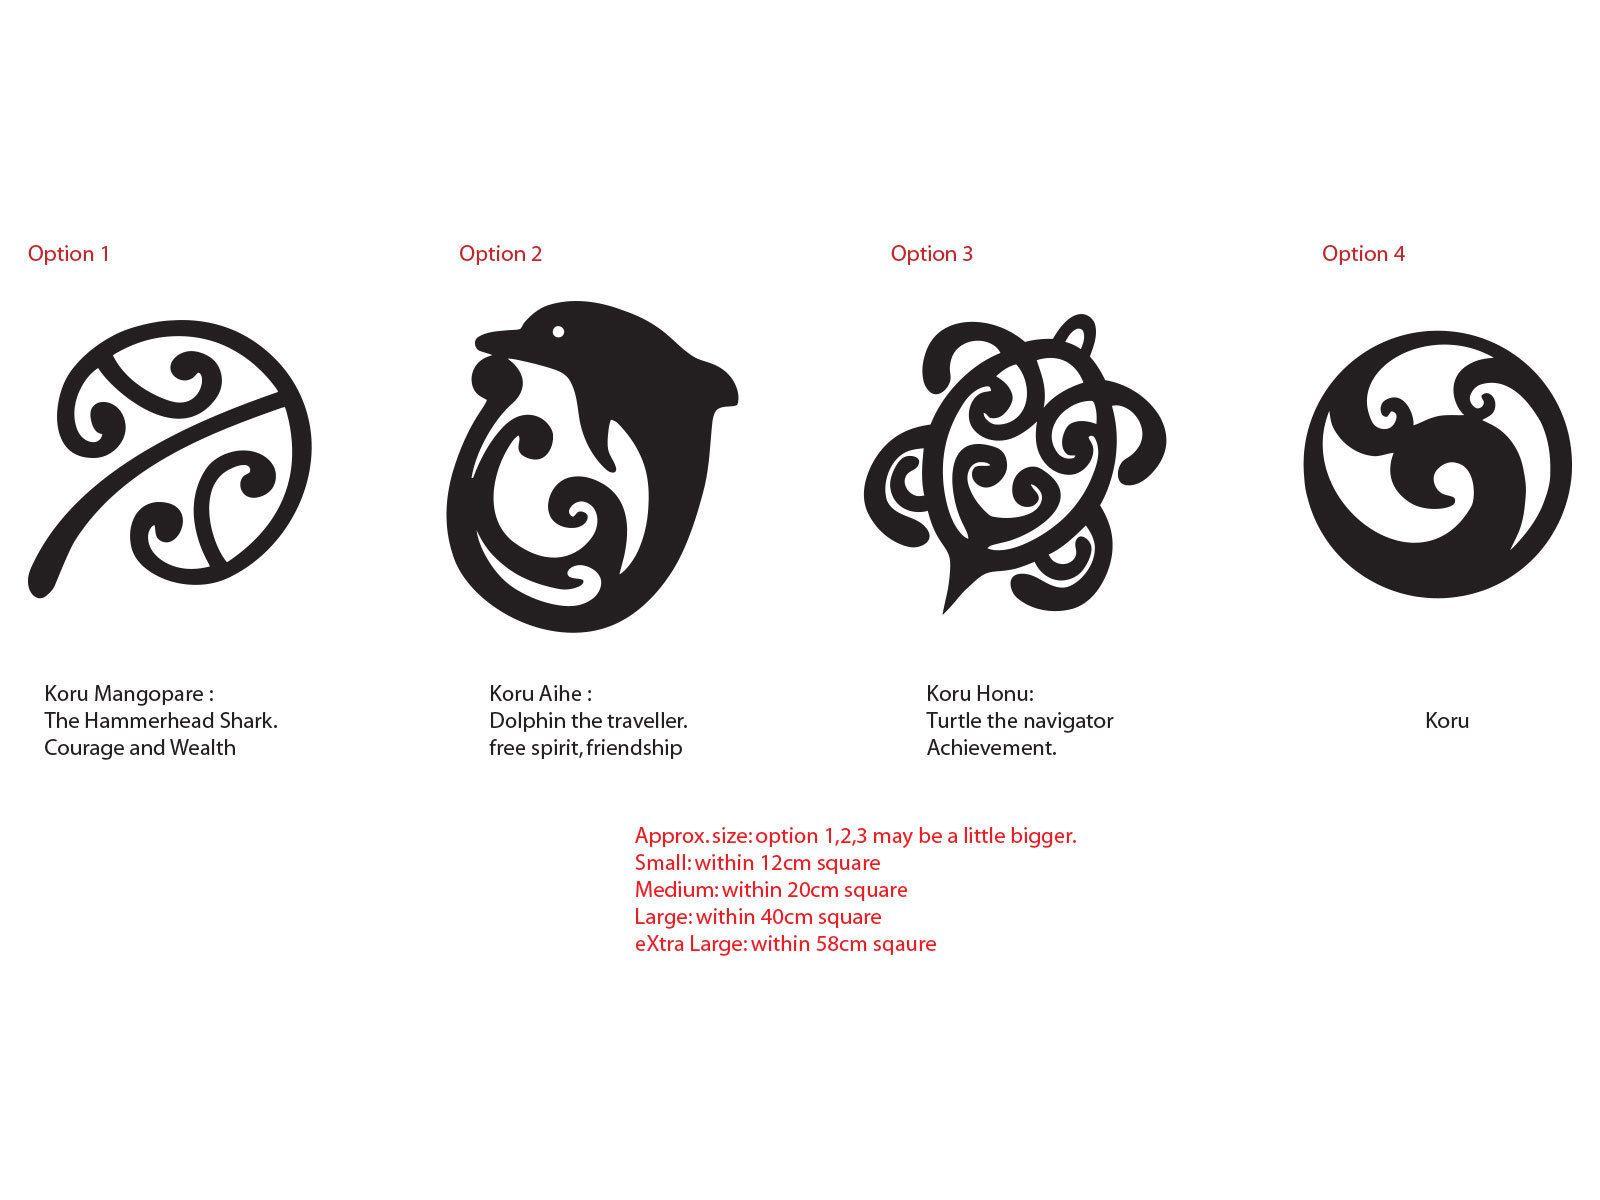 Maori koru mangopare honu aihe nz kiwi symbol car tattoo decal maori koru mangopare honu aihe nz kiwi symbol car tattoo decal vinyl sticker ebay buycottarizona